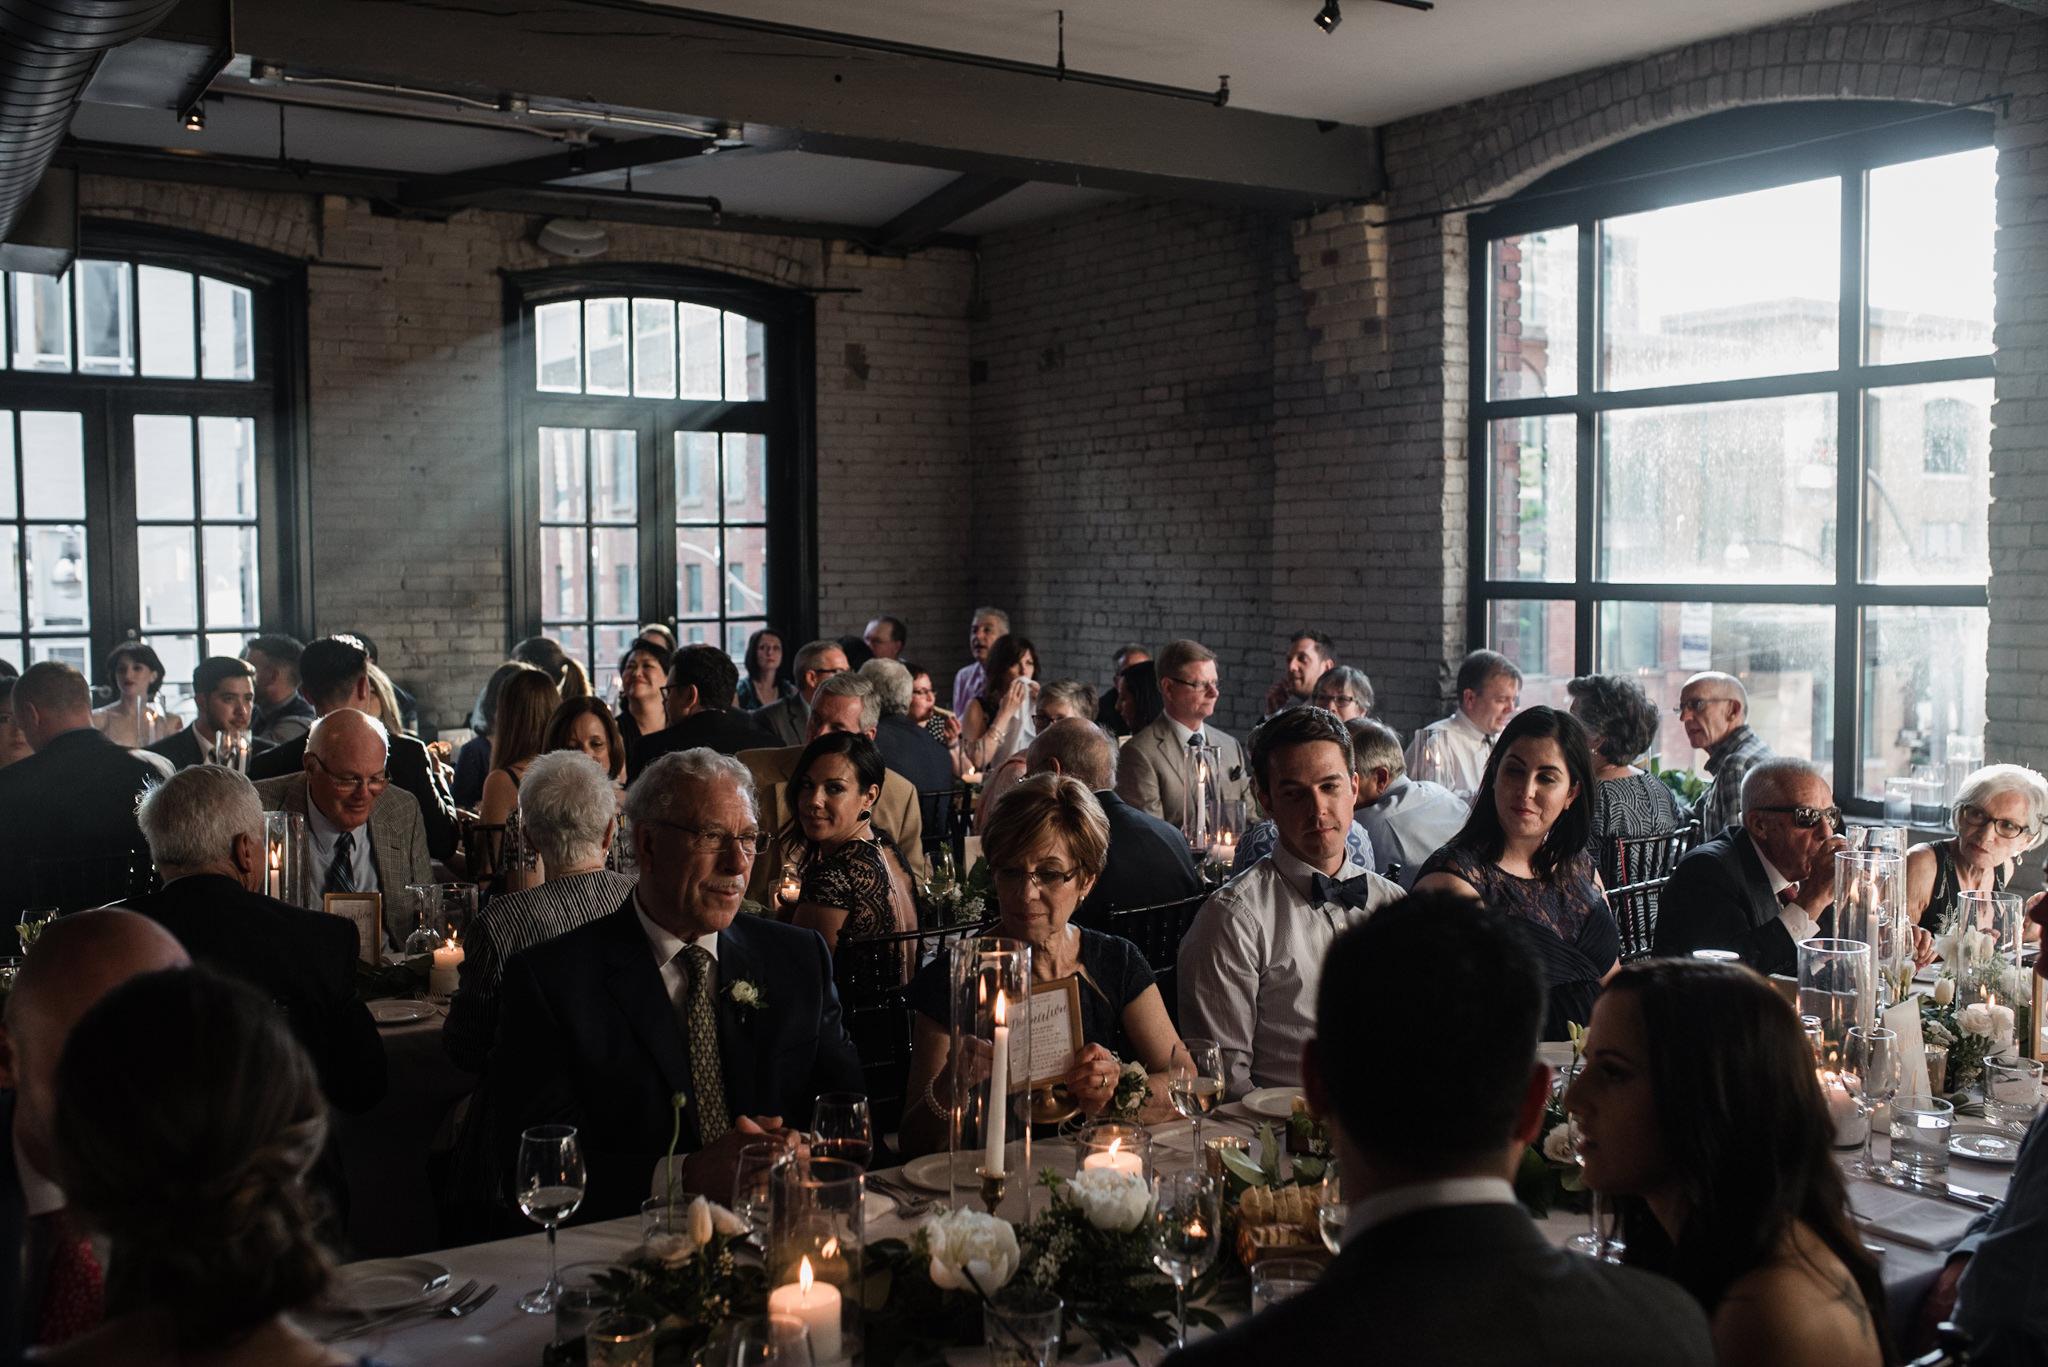 078-documentary-toronto-wedding-photographer-industrial-wedding.jpg